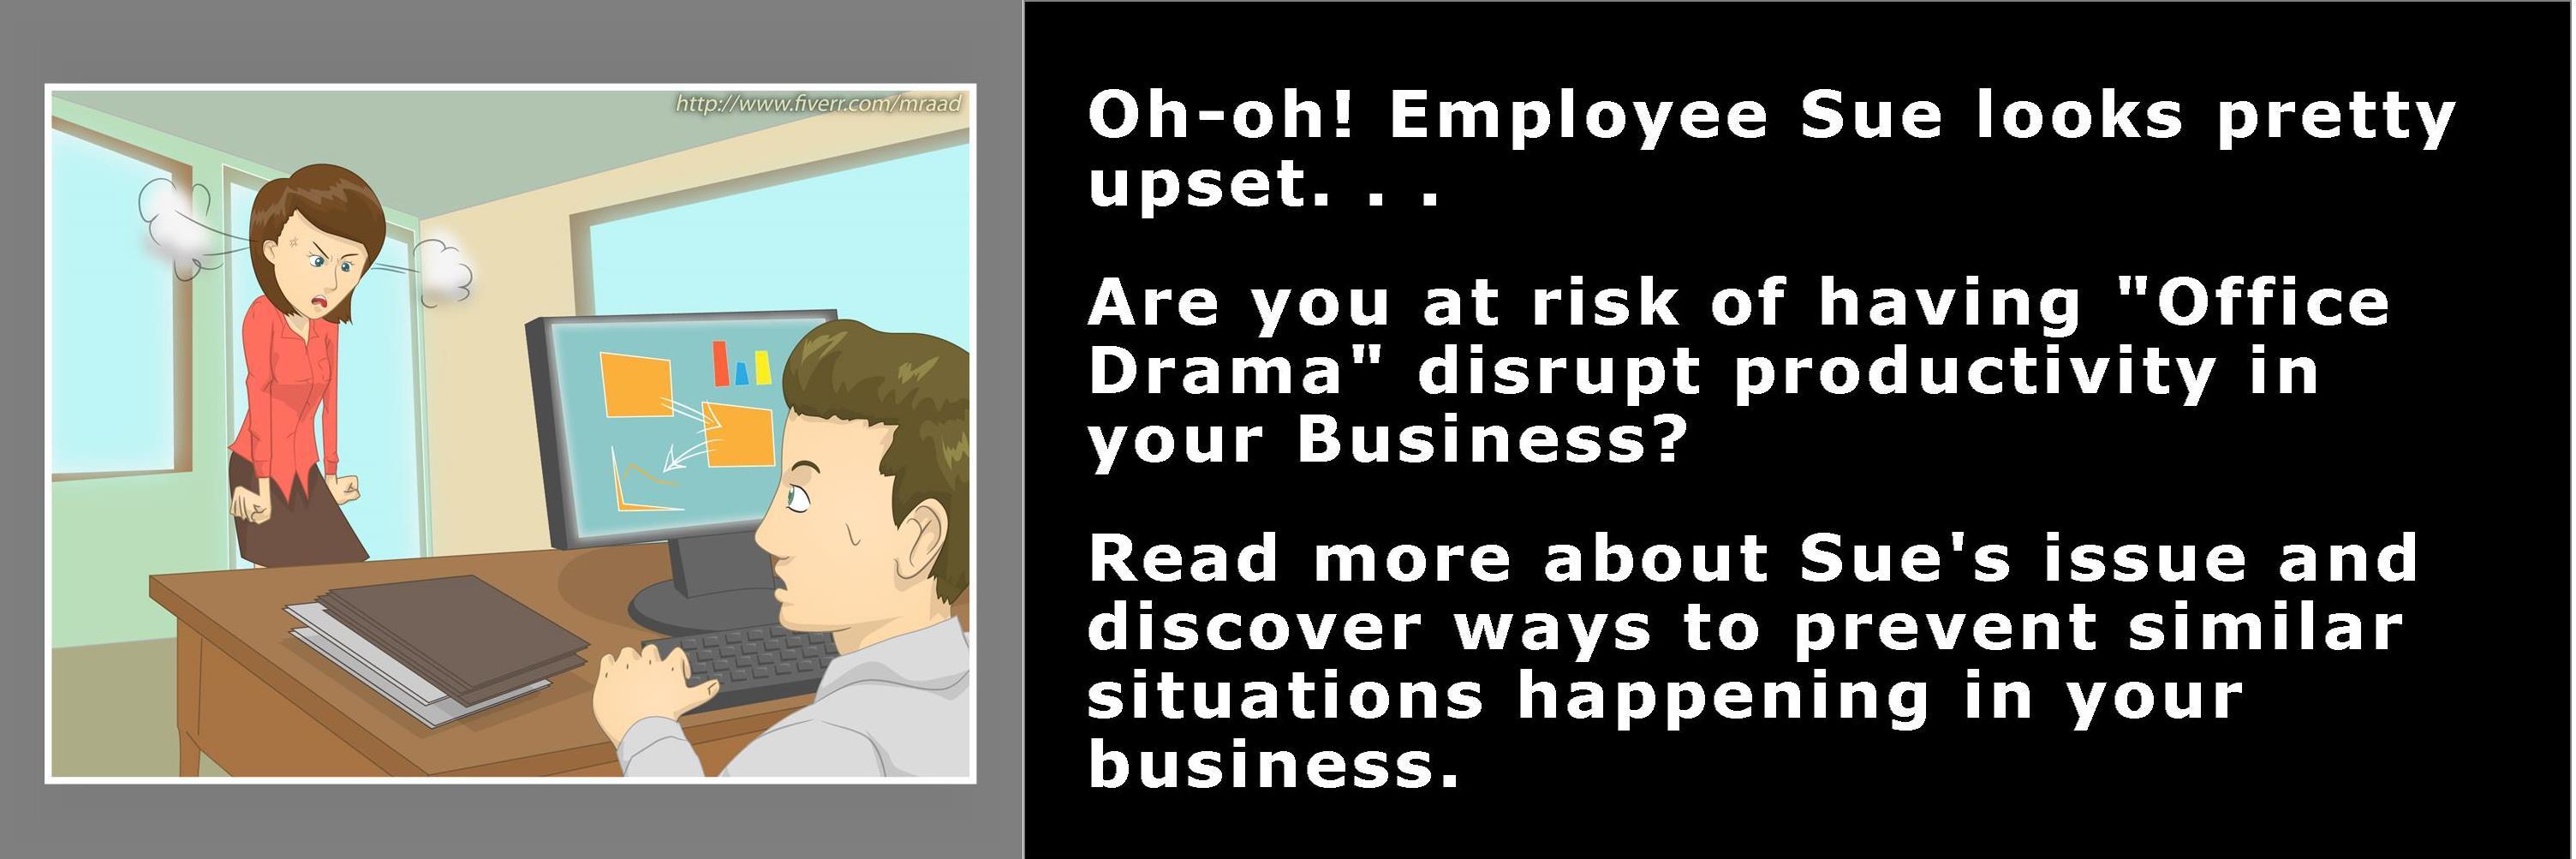 Employee Dispute